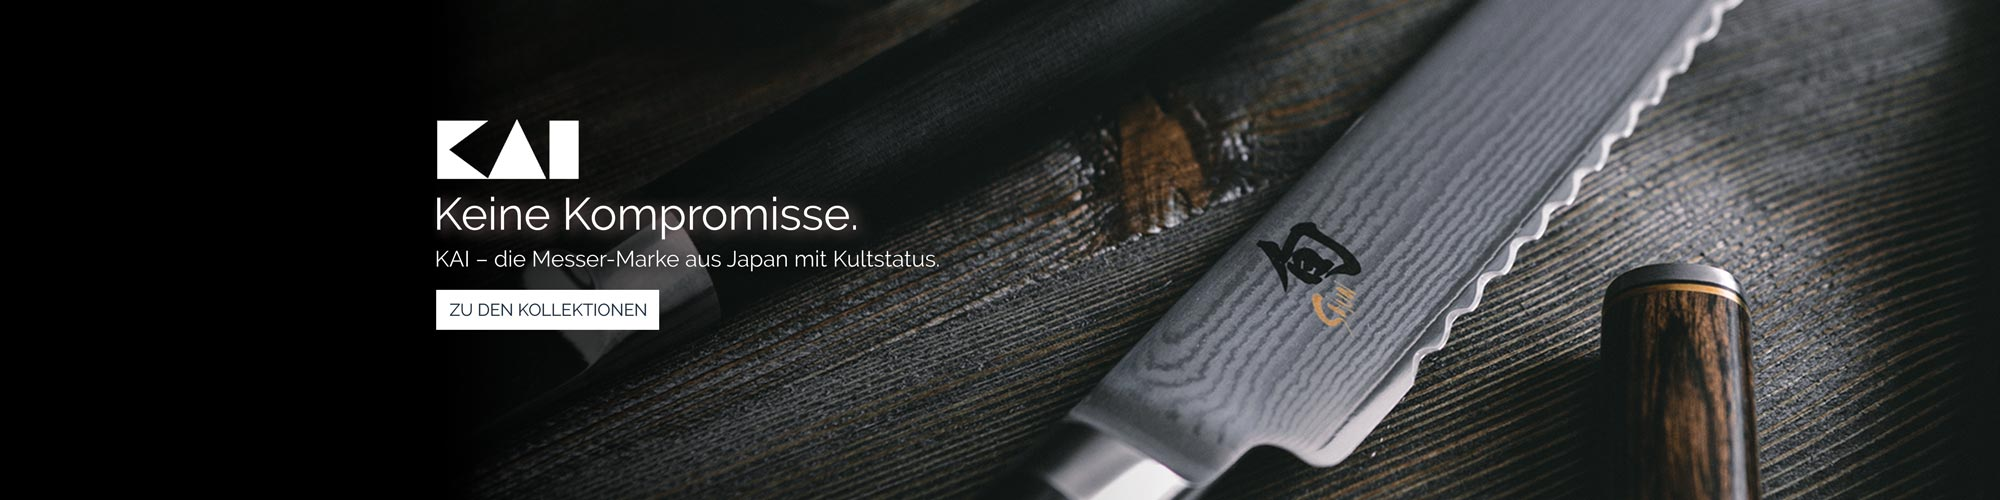 KAI Messer aus Japan